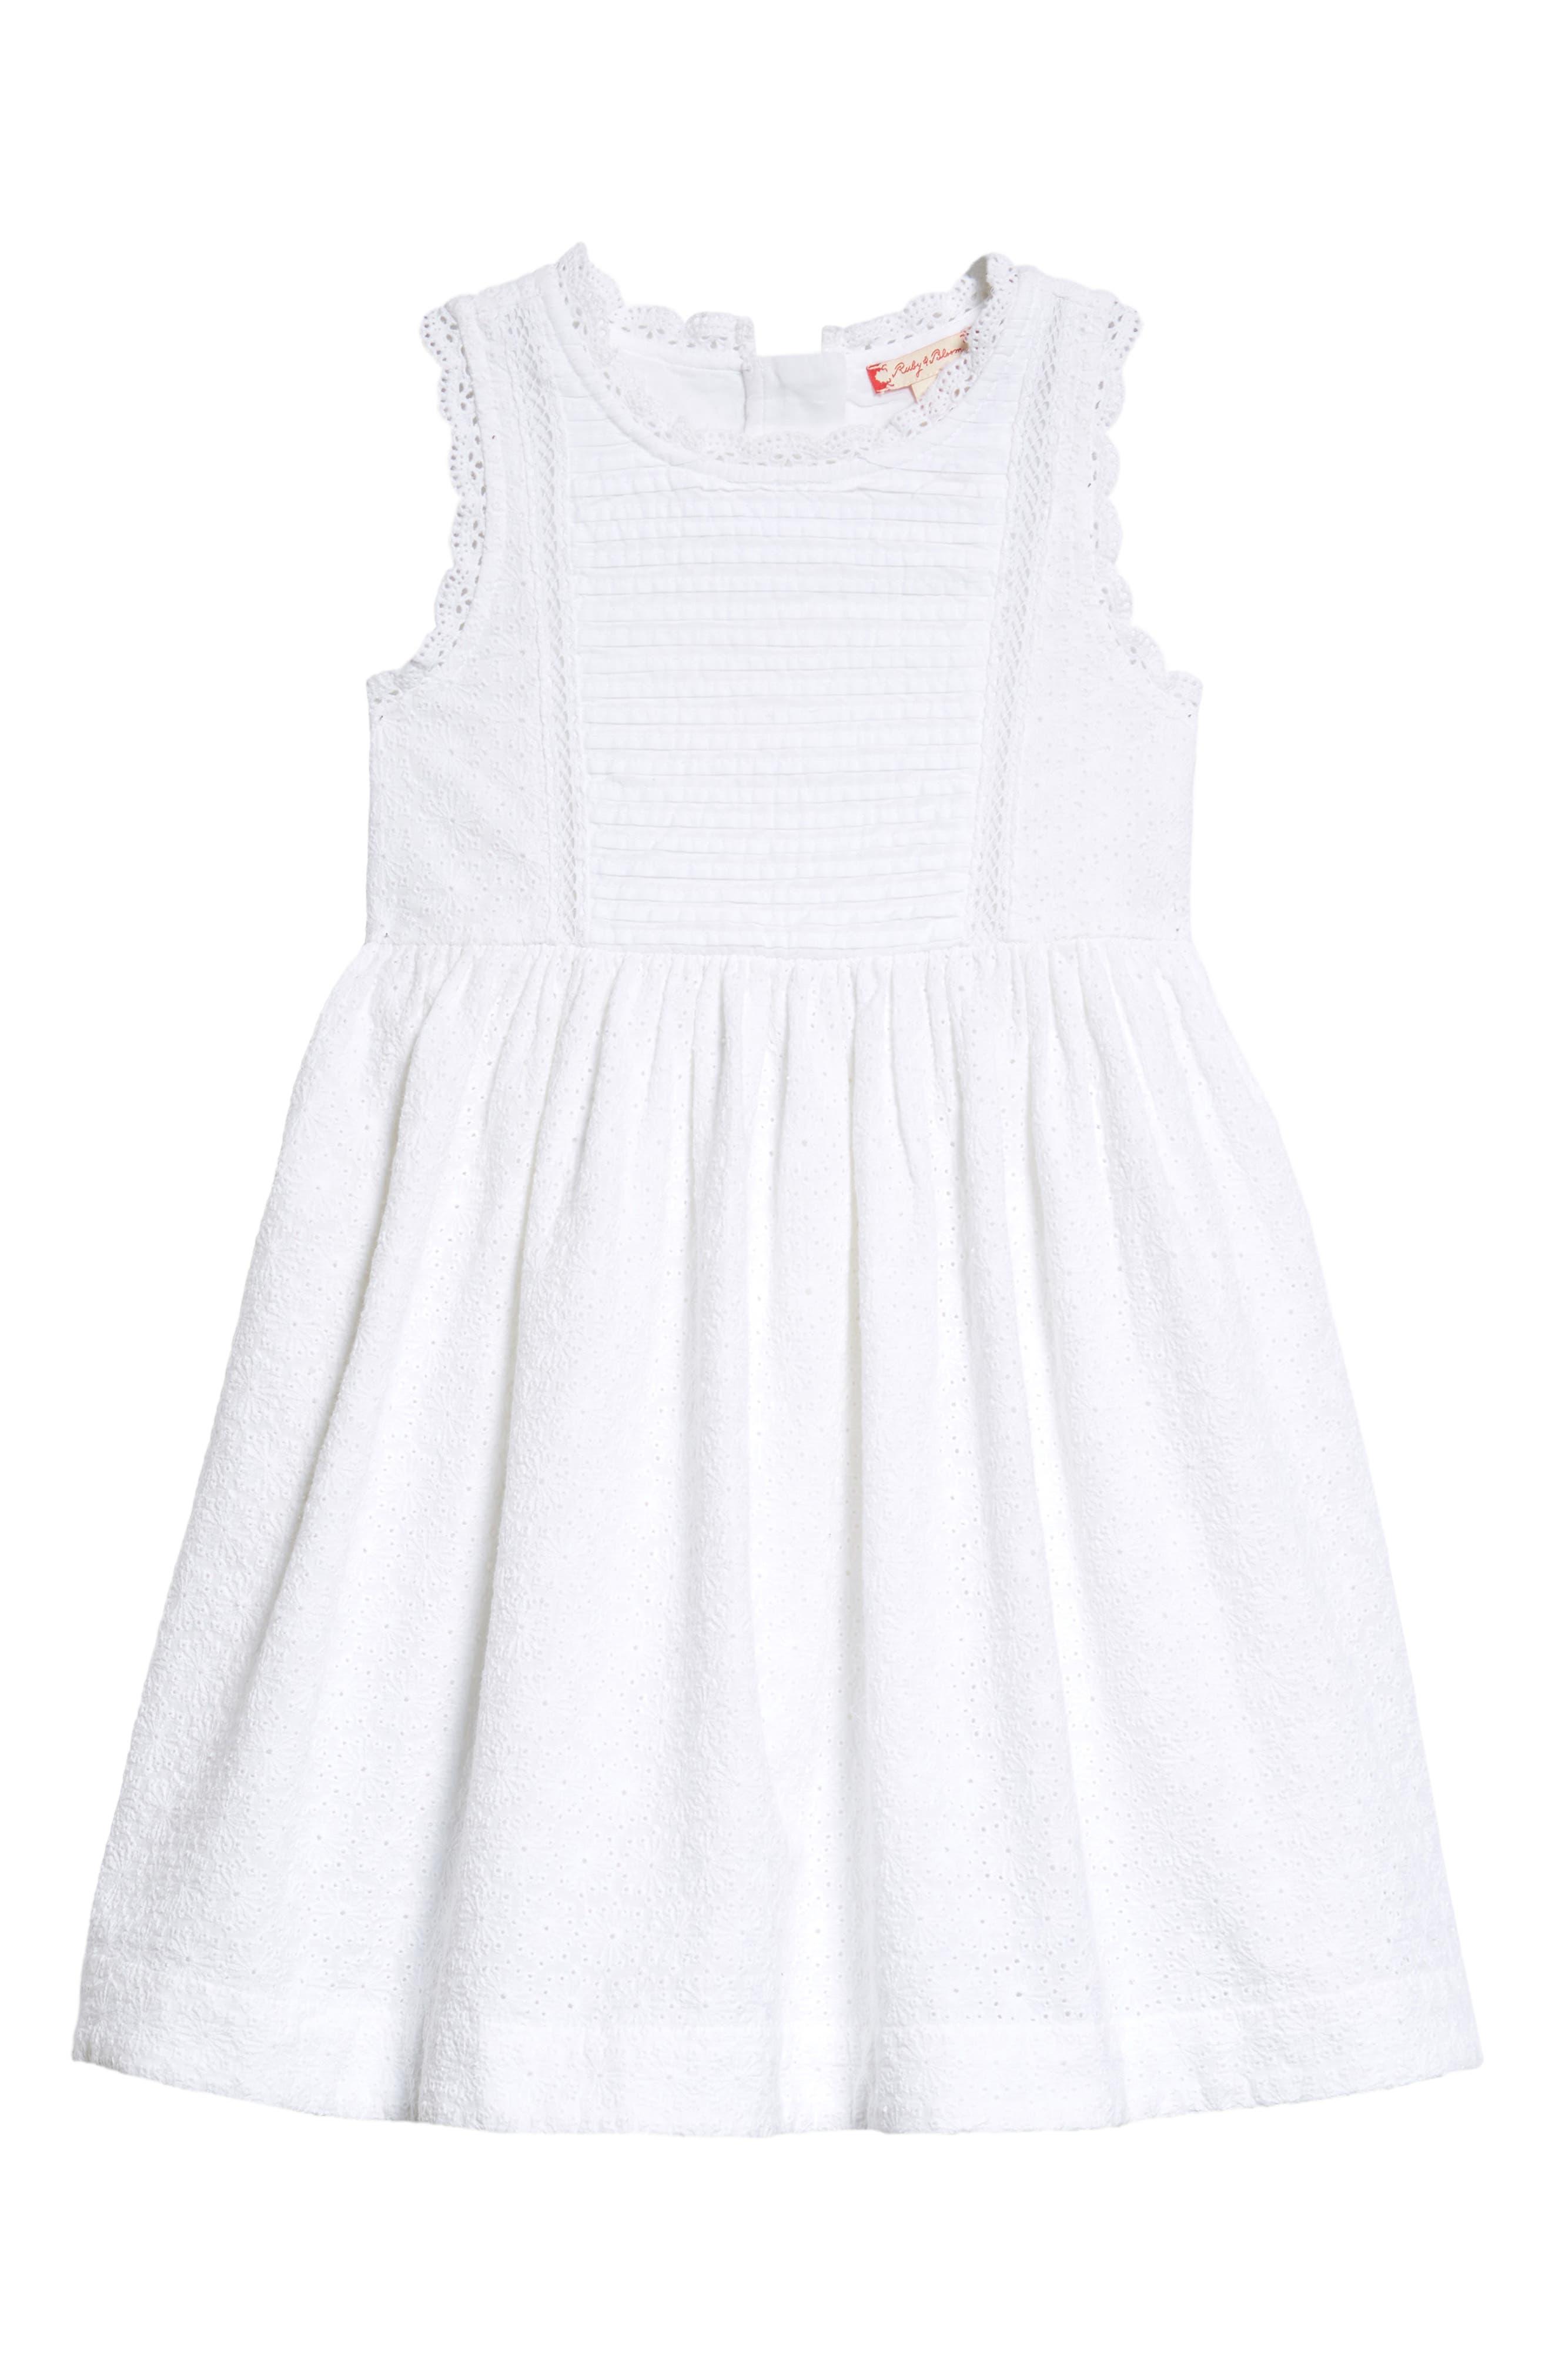 Main Image - Ruby & Bloom Lace Shift Dress (Toddler Girls, Little Girls & Big Girls)